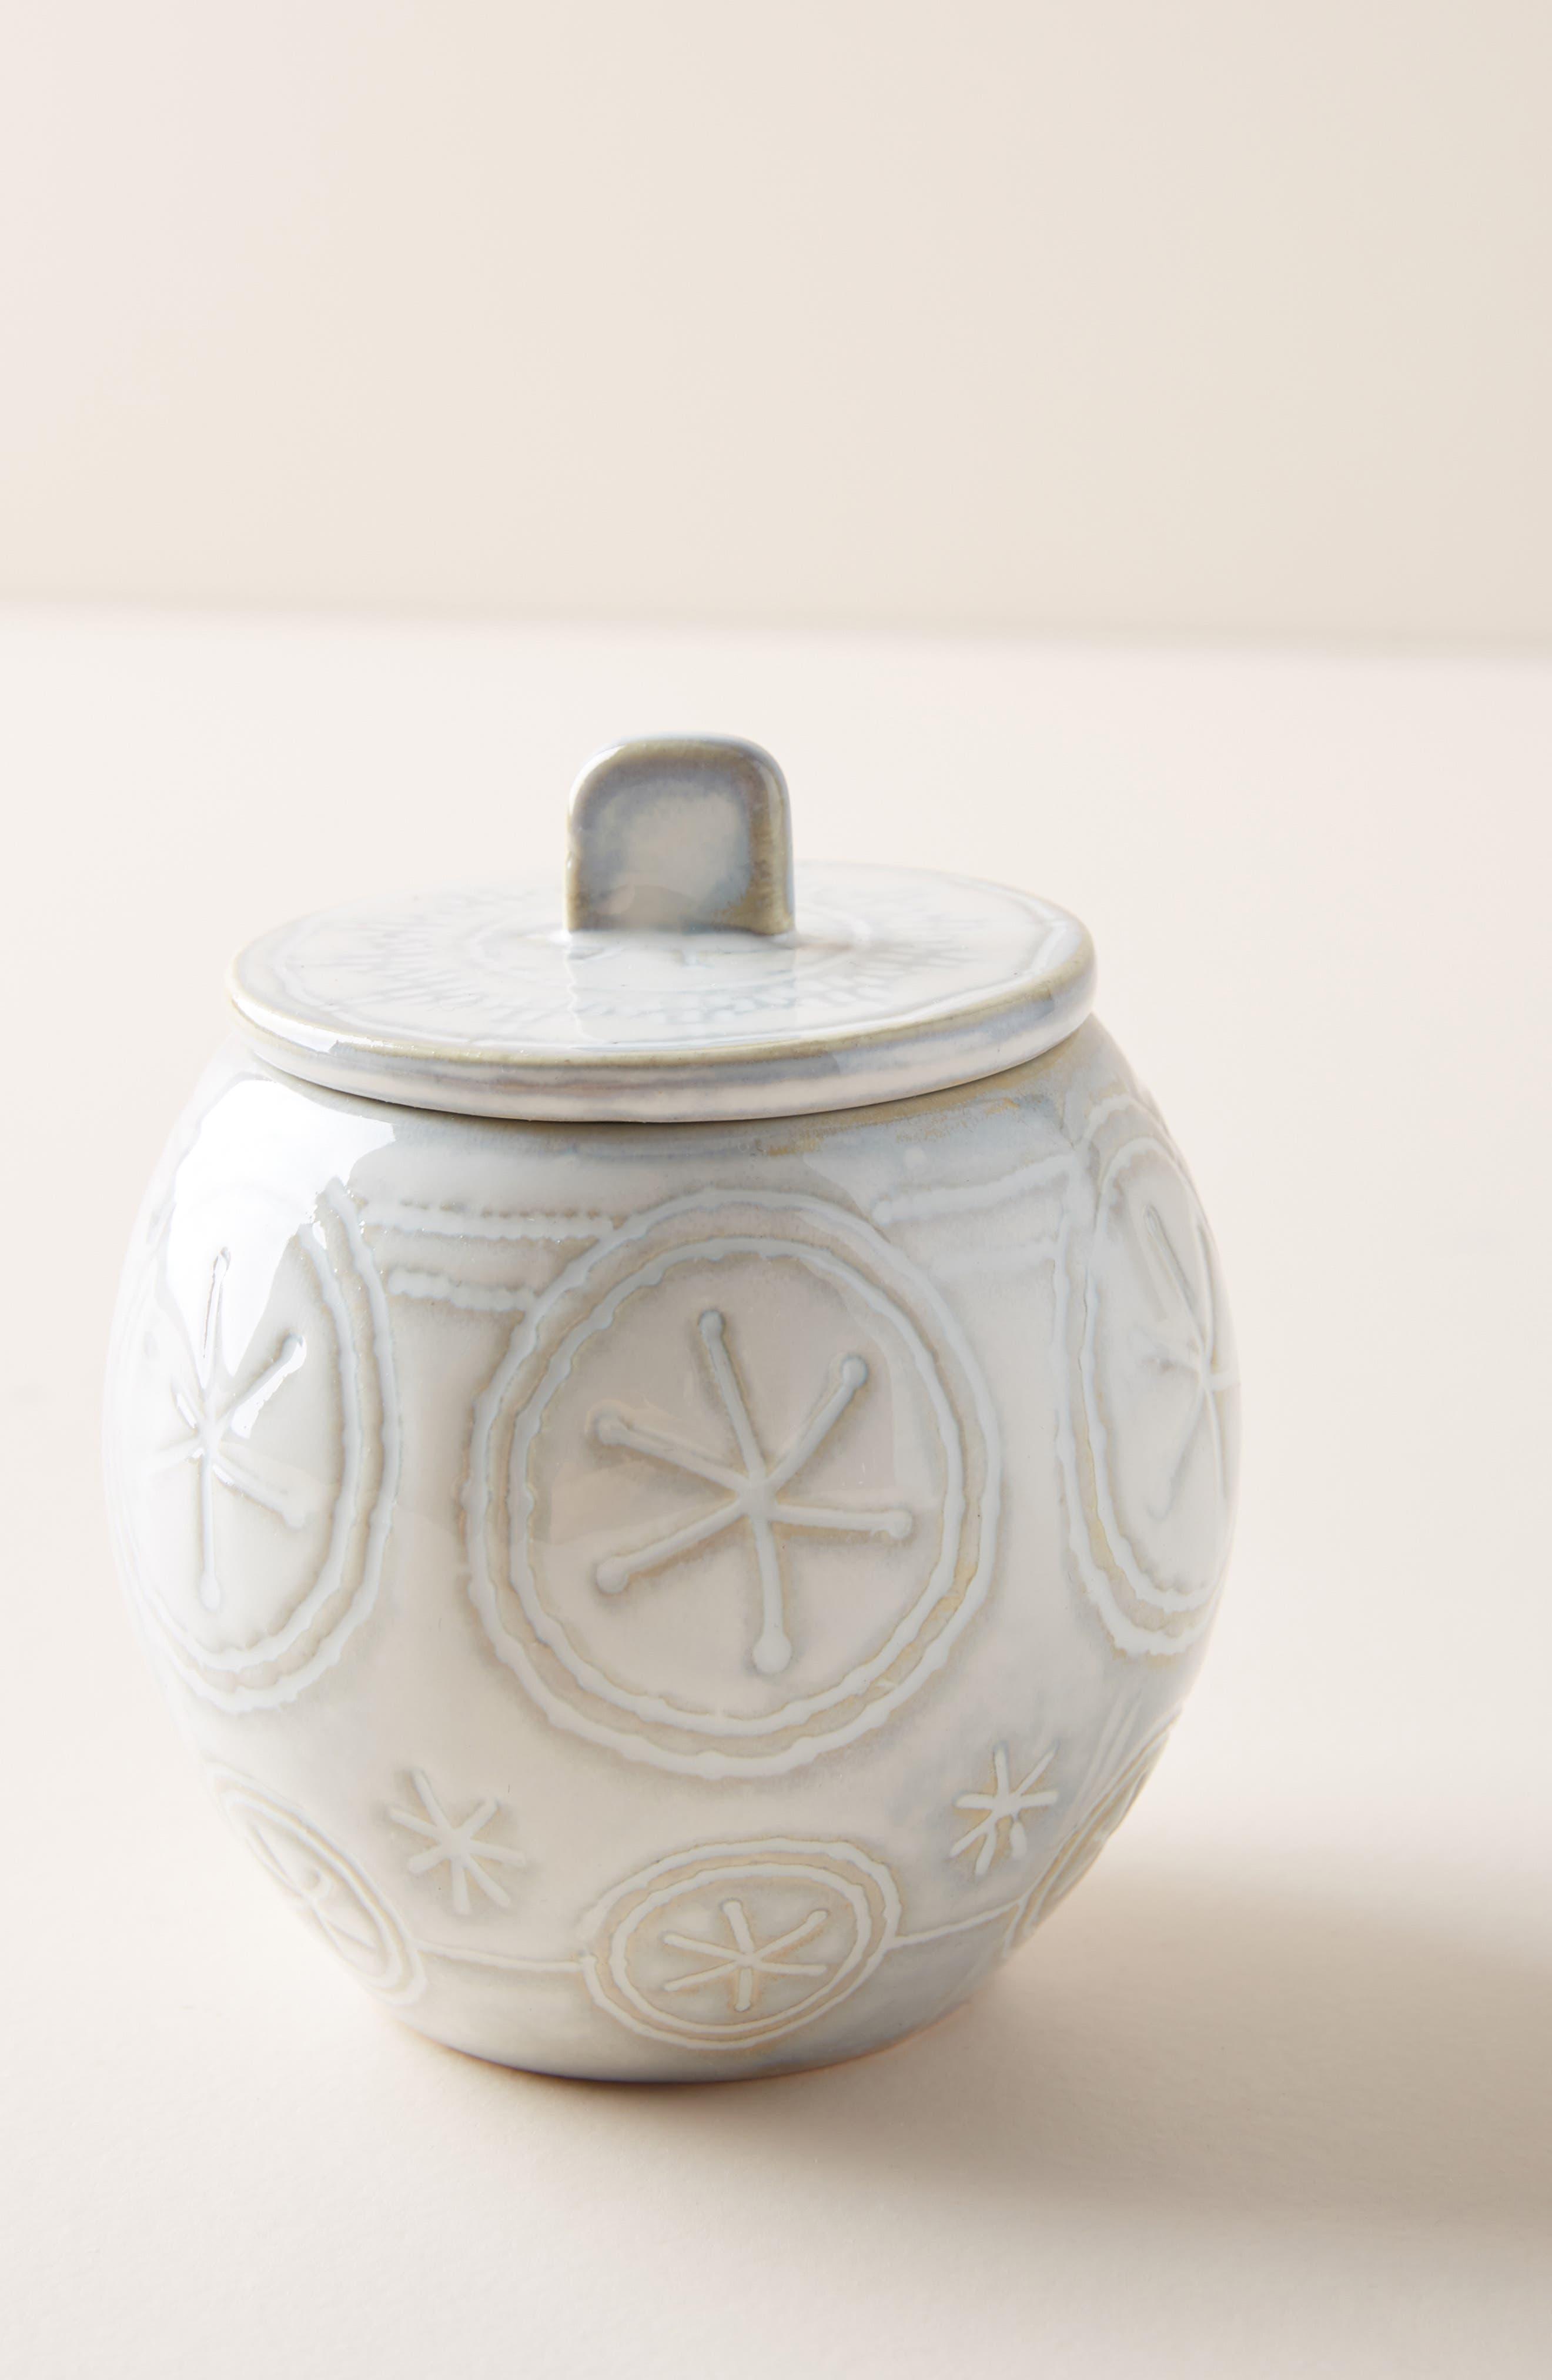 anthropologie uret sugar bowl